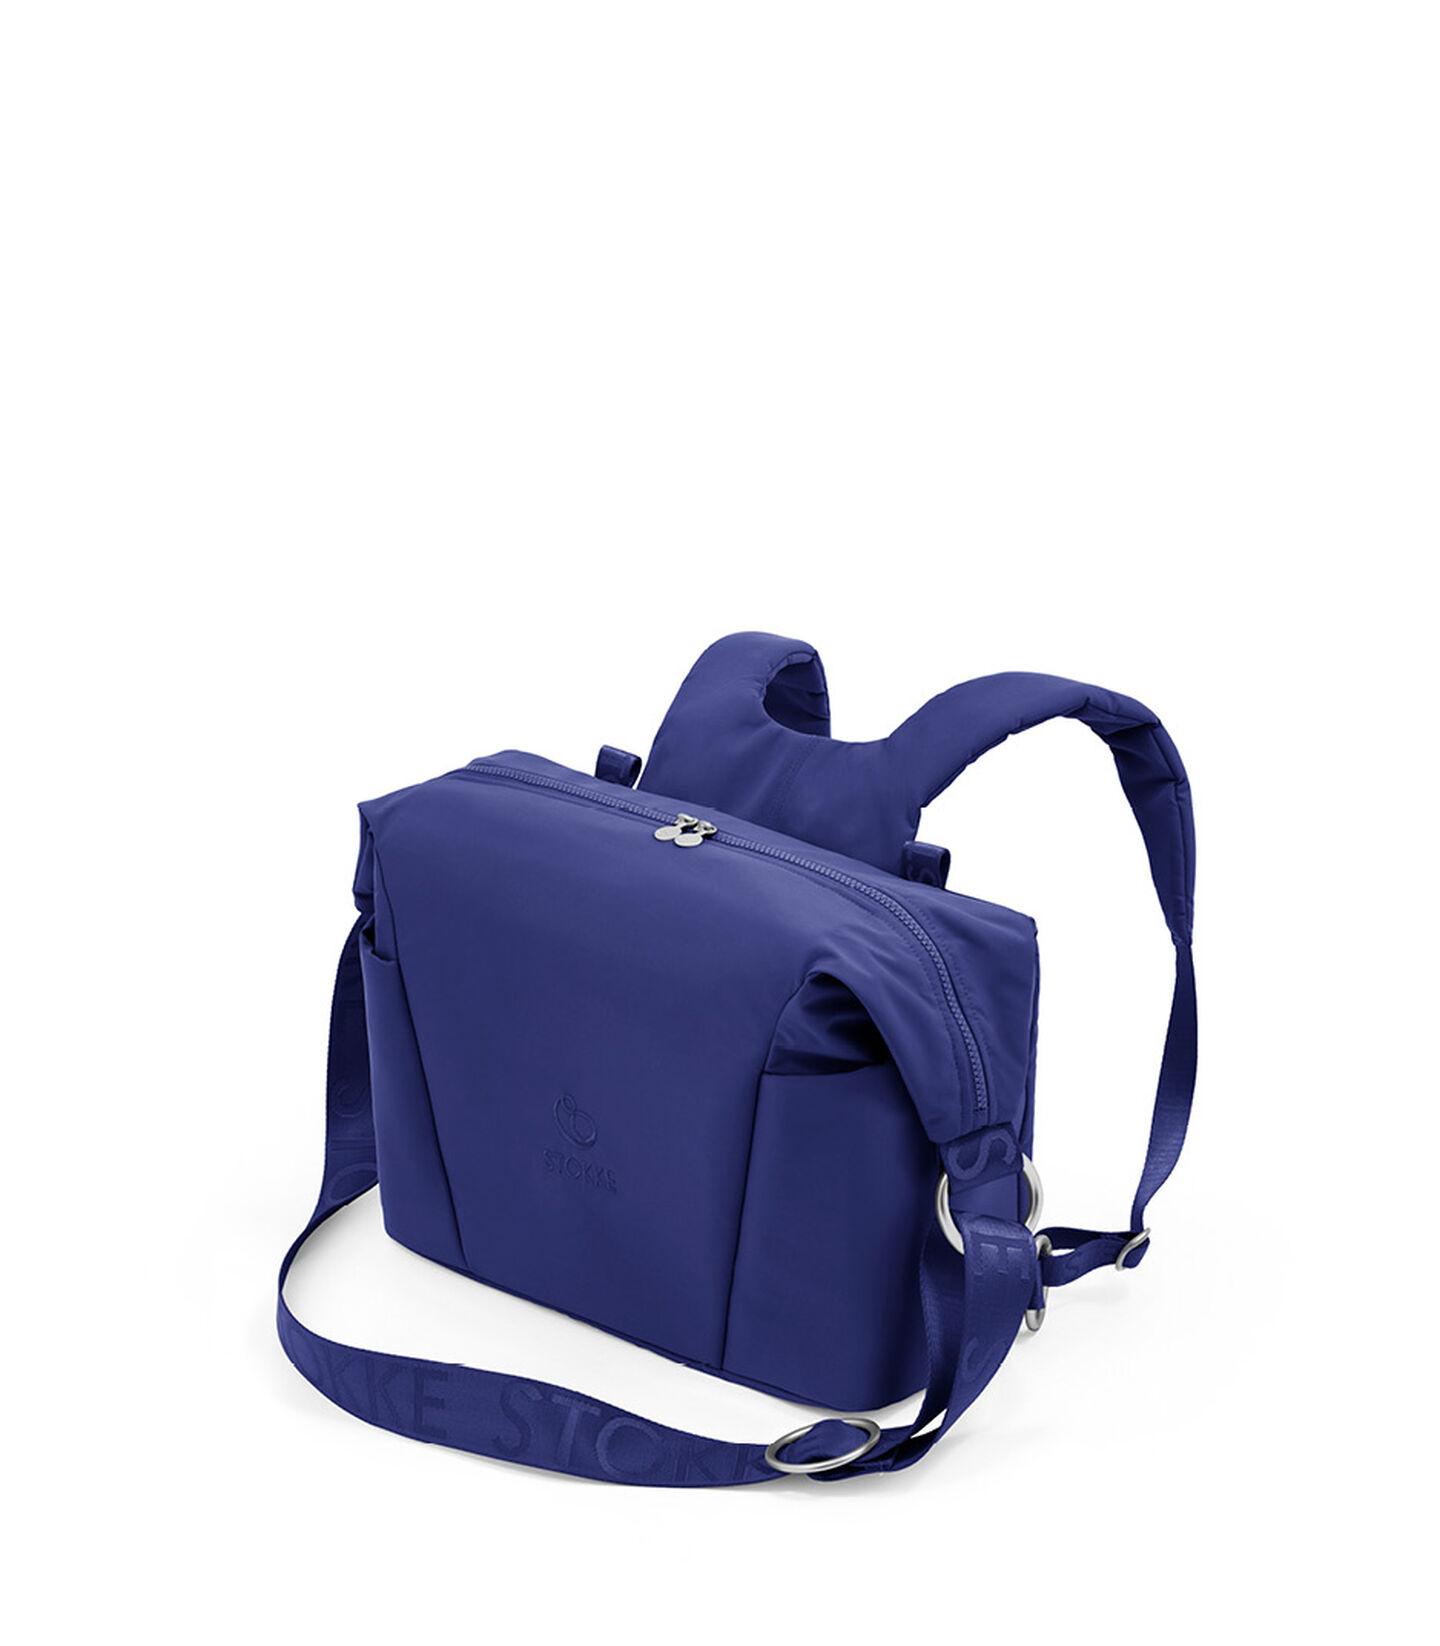 Stokke® Xplory® X verzorgingstas Royal Blue, Royal Blue, mainview view 1